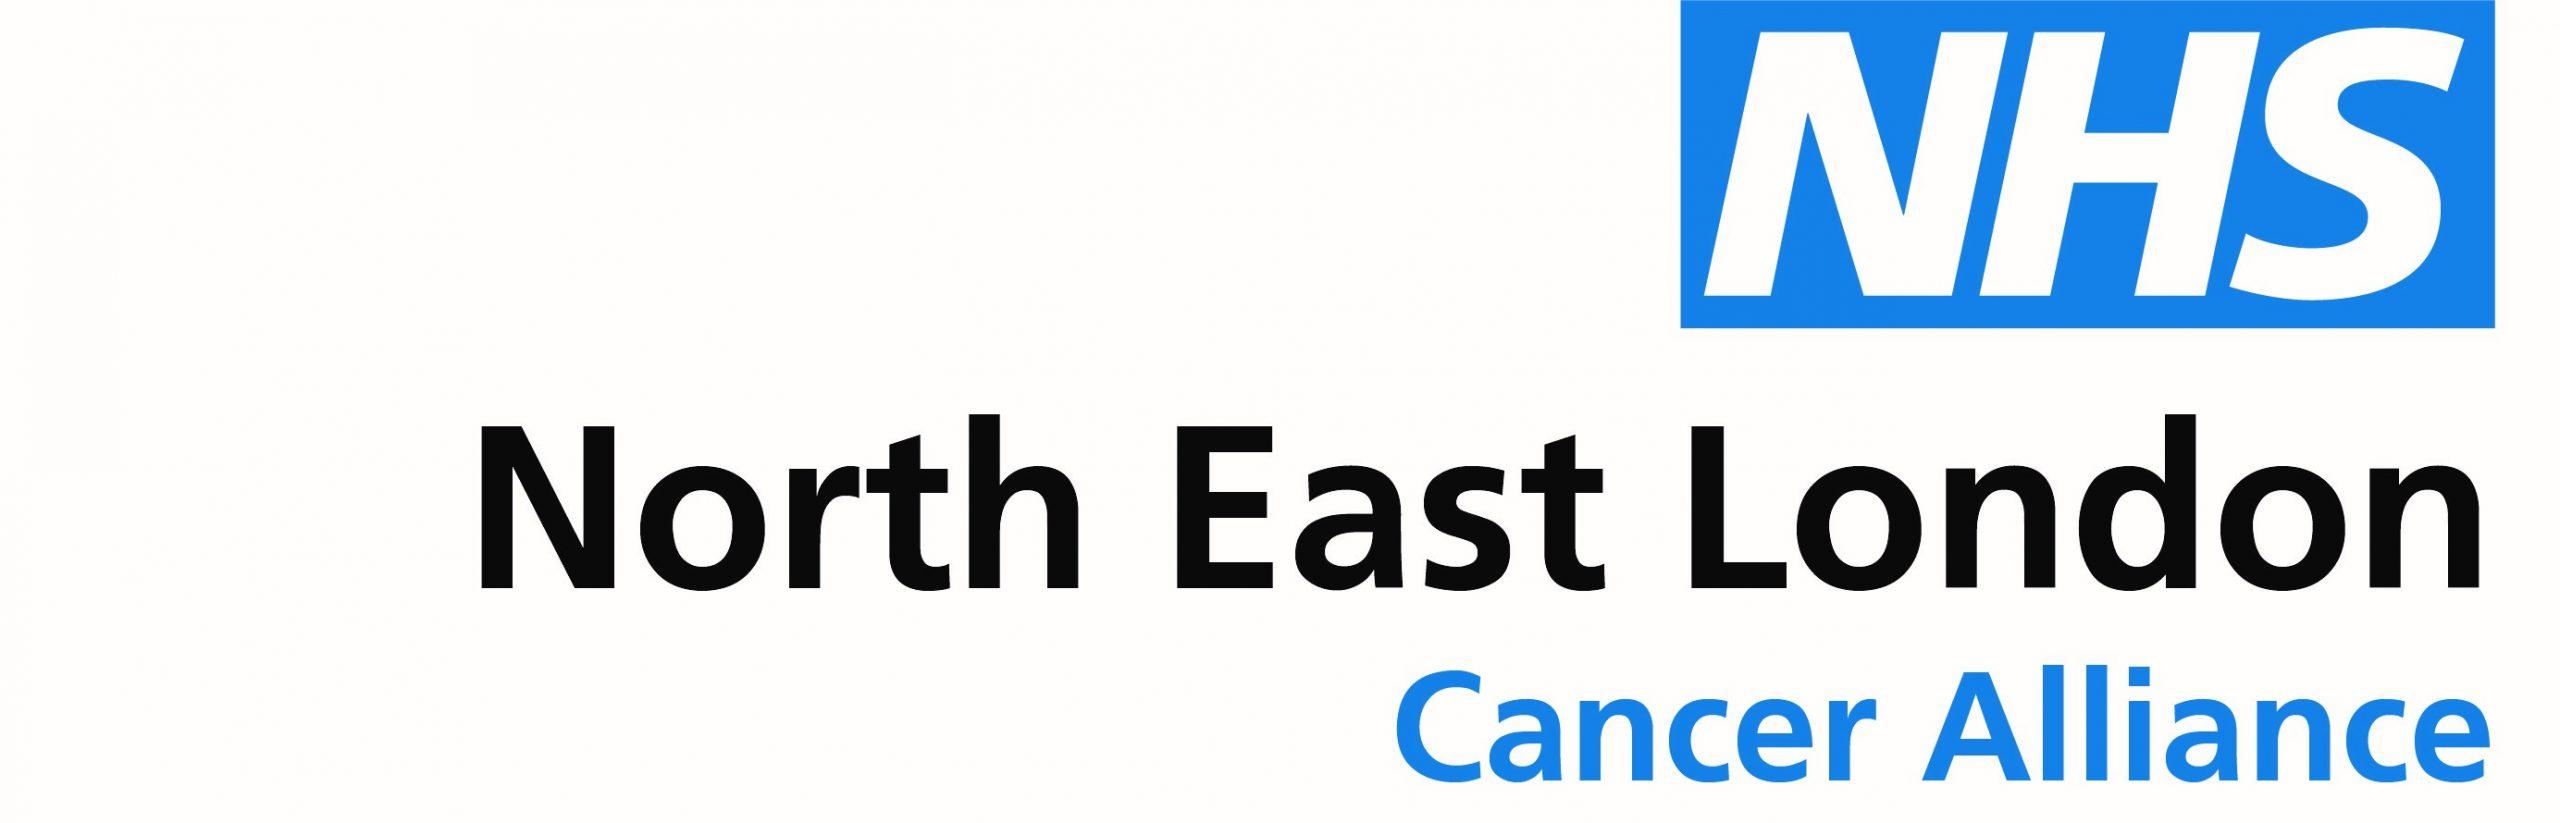 NEL Cancer Alliance logo